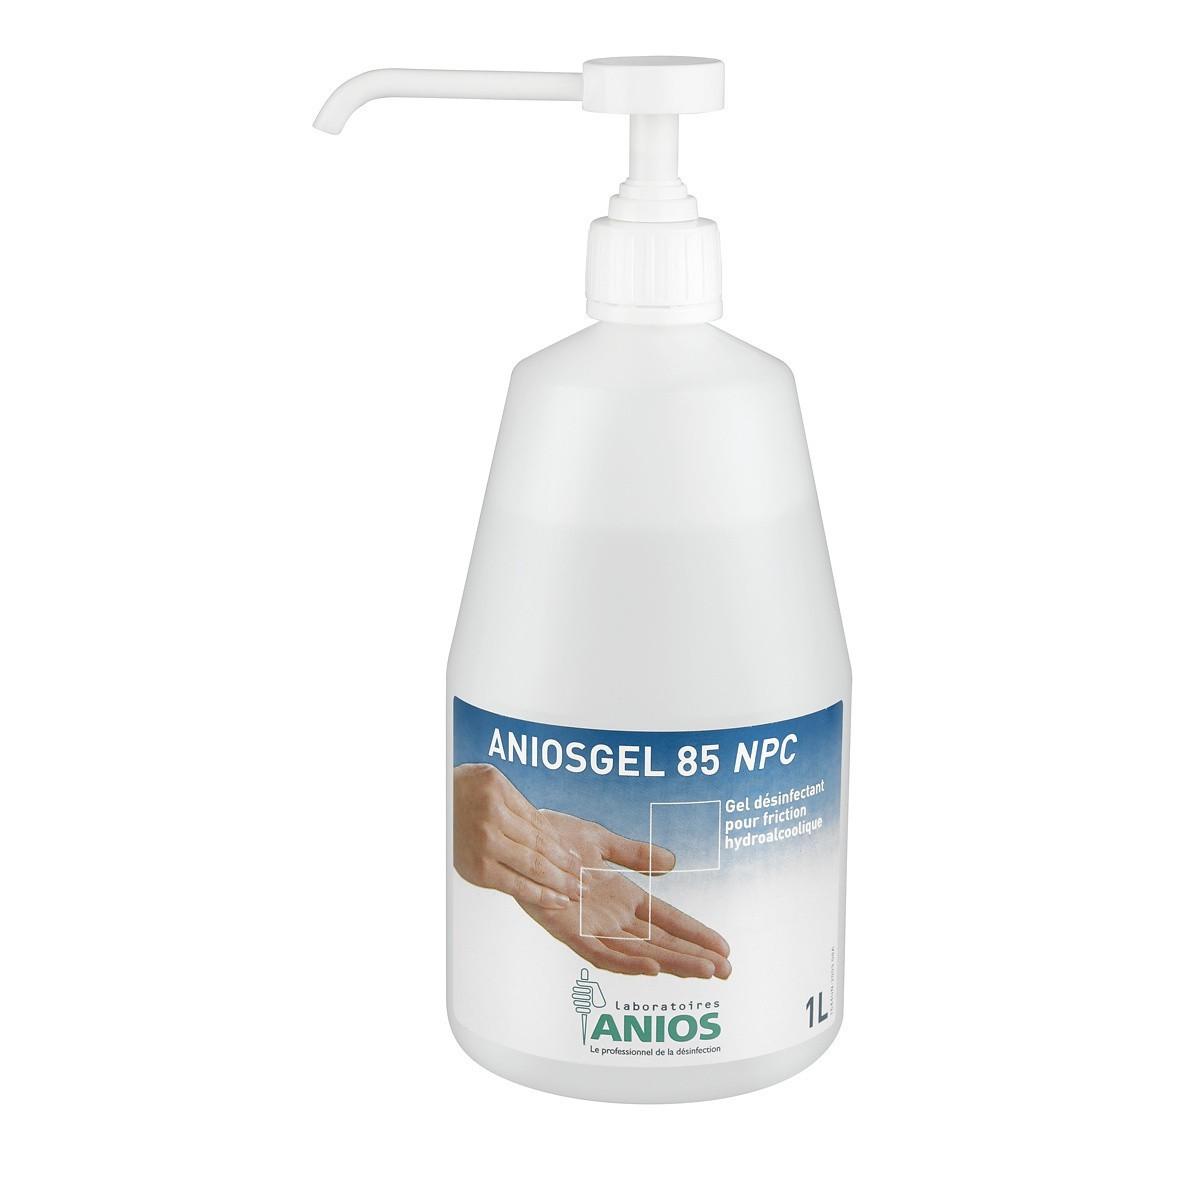 dezinfekcia na ruky Aniosgel 85 NPC 1L + pumpa megamix.sk